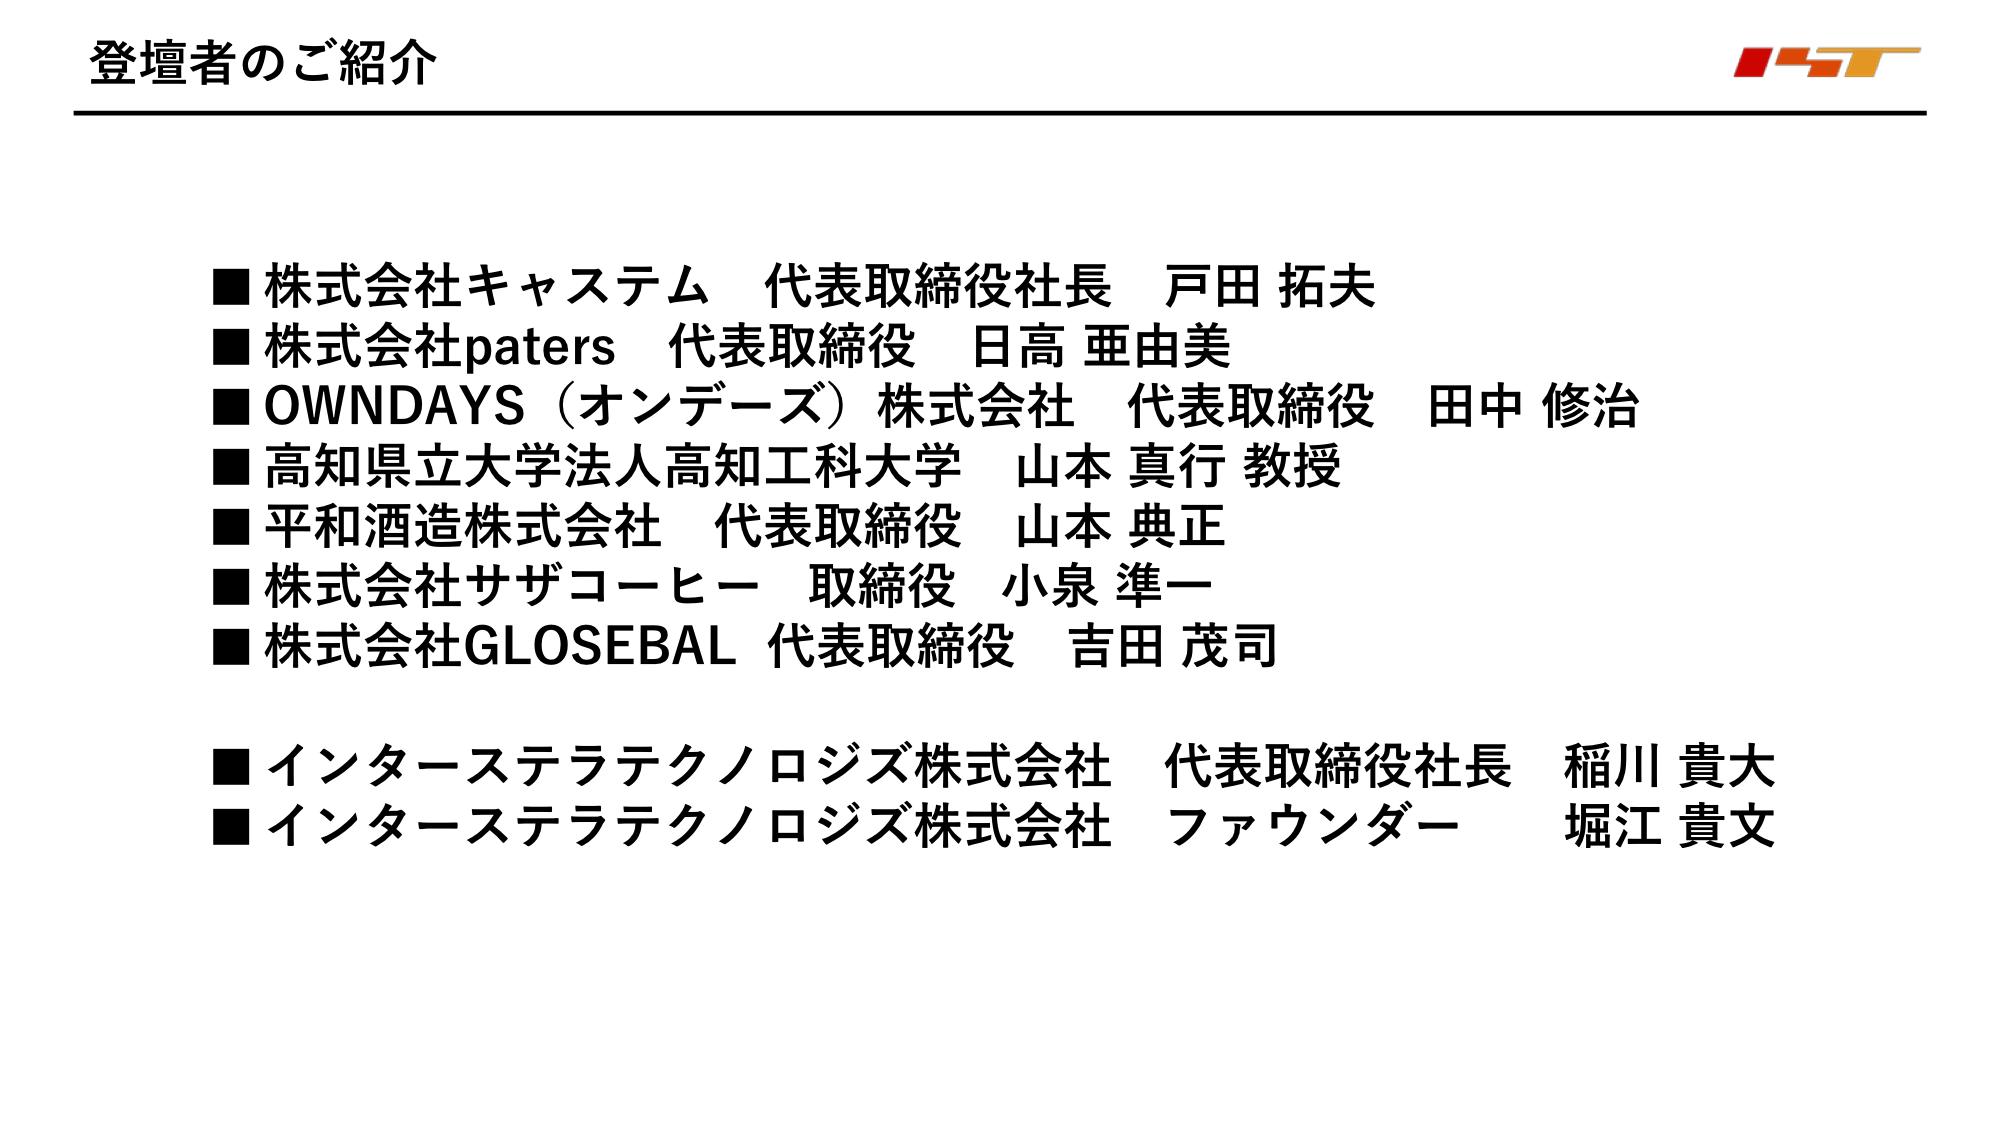 f:id:Imamura:20190628160935p:plain